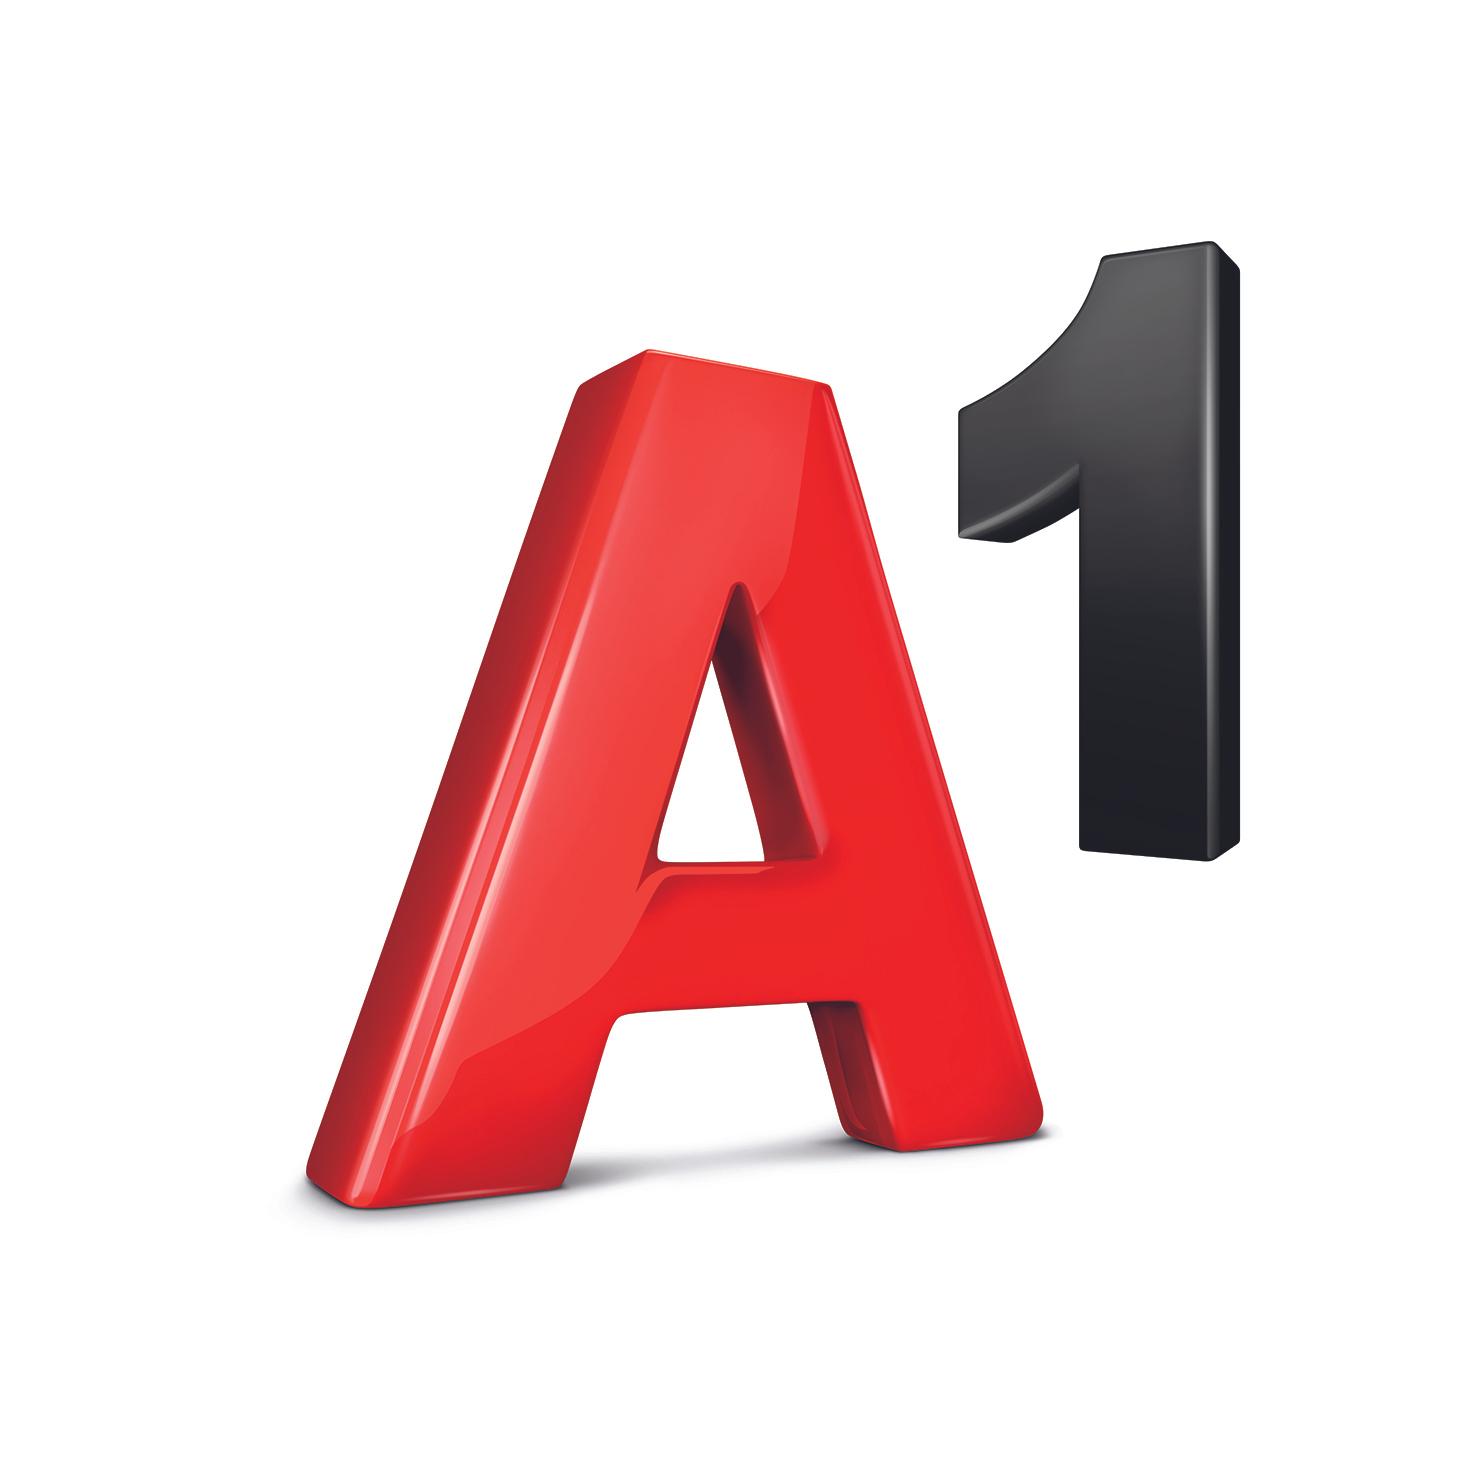 A1 erhöht Festnetz-Grundgebühr ab 1.9.2018 - Sonderkündigungsrecht